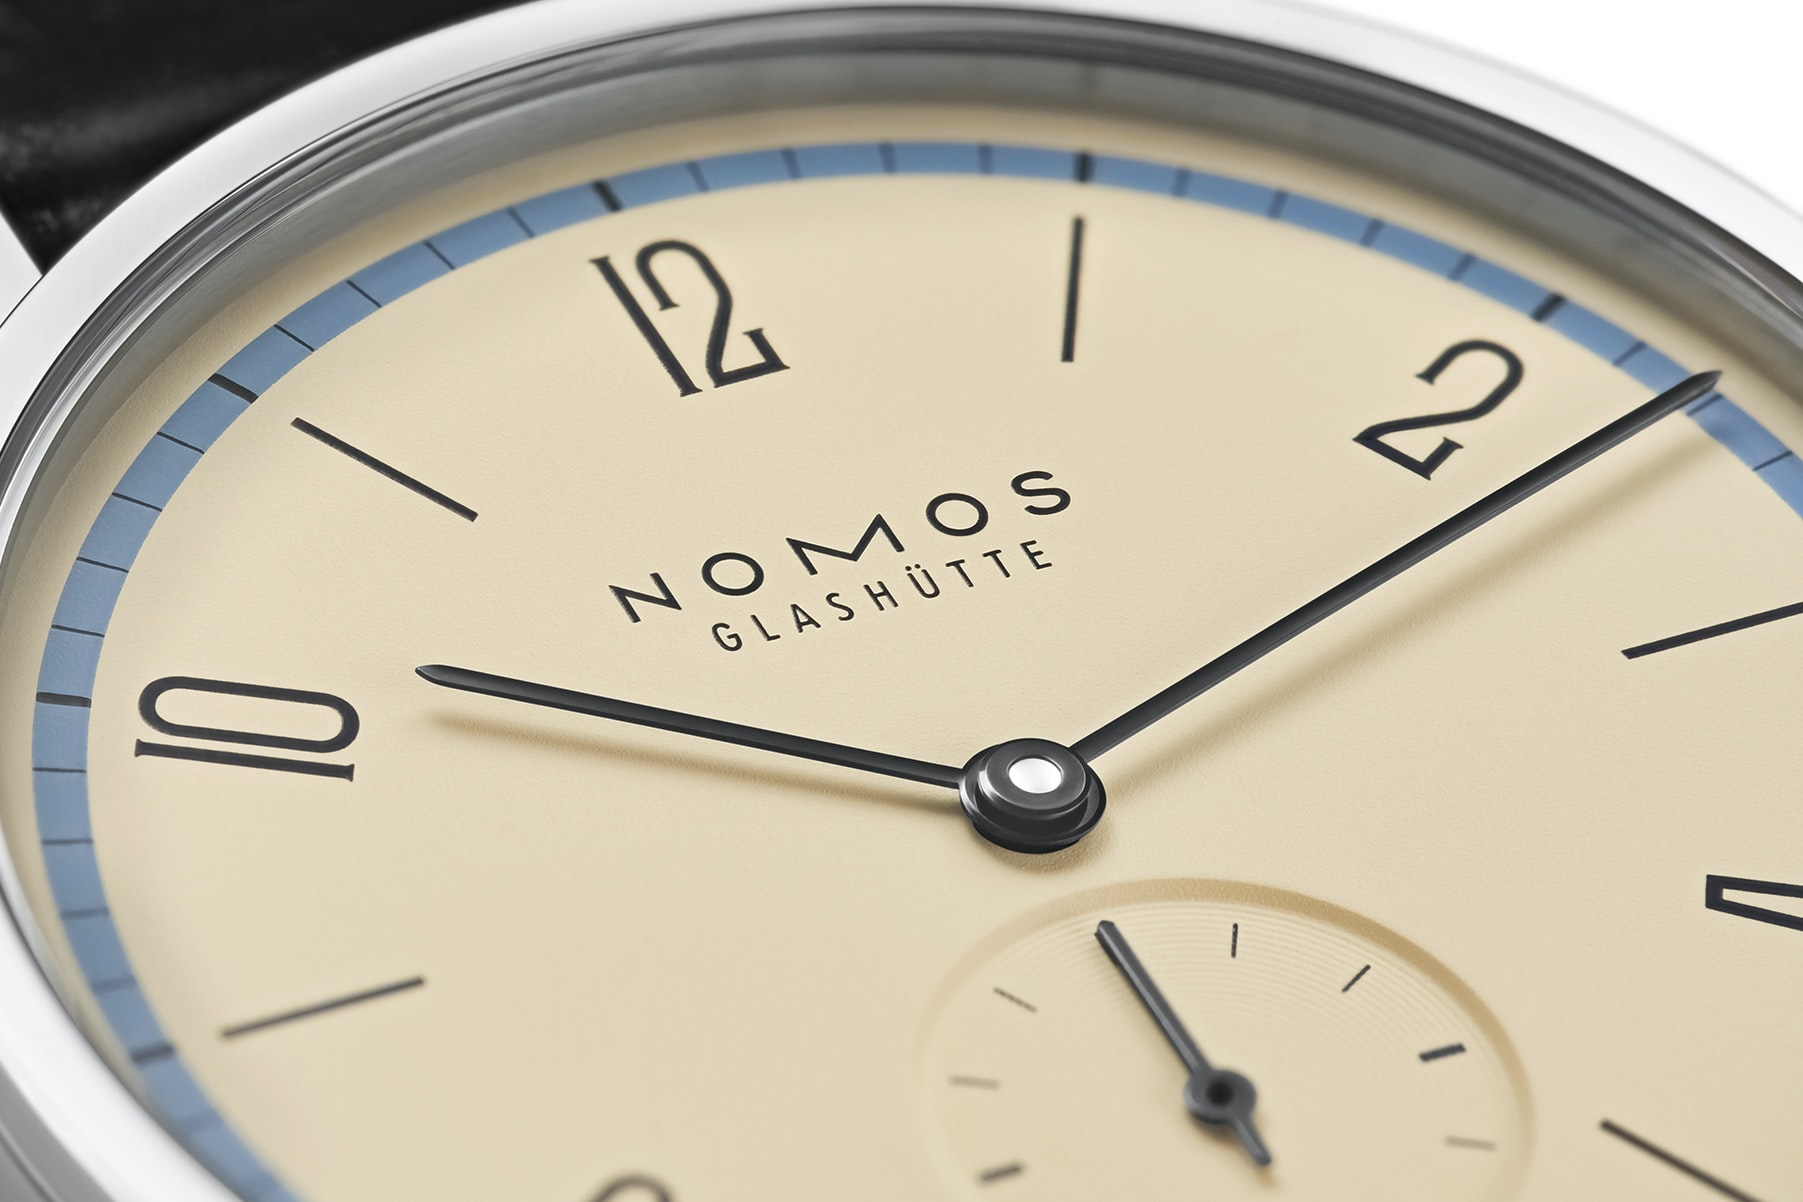 Introducing: The NOMOS Glashütte Tangente 'A Century Of Bauhaus' Limited Editions (Exclusive) nomos 13